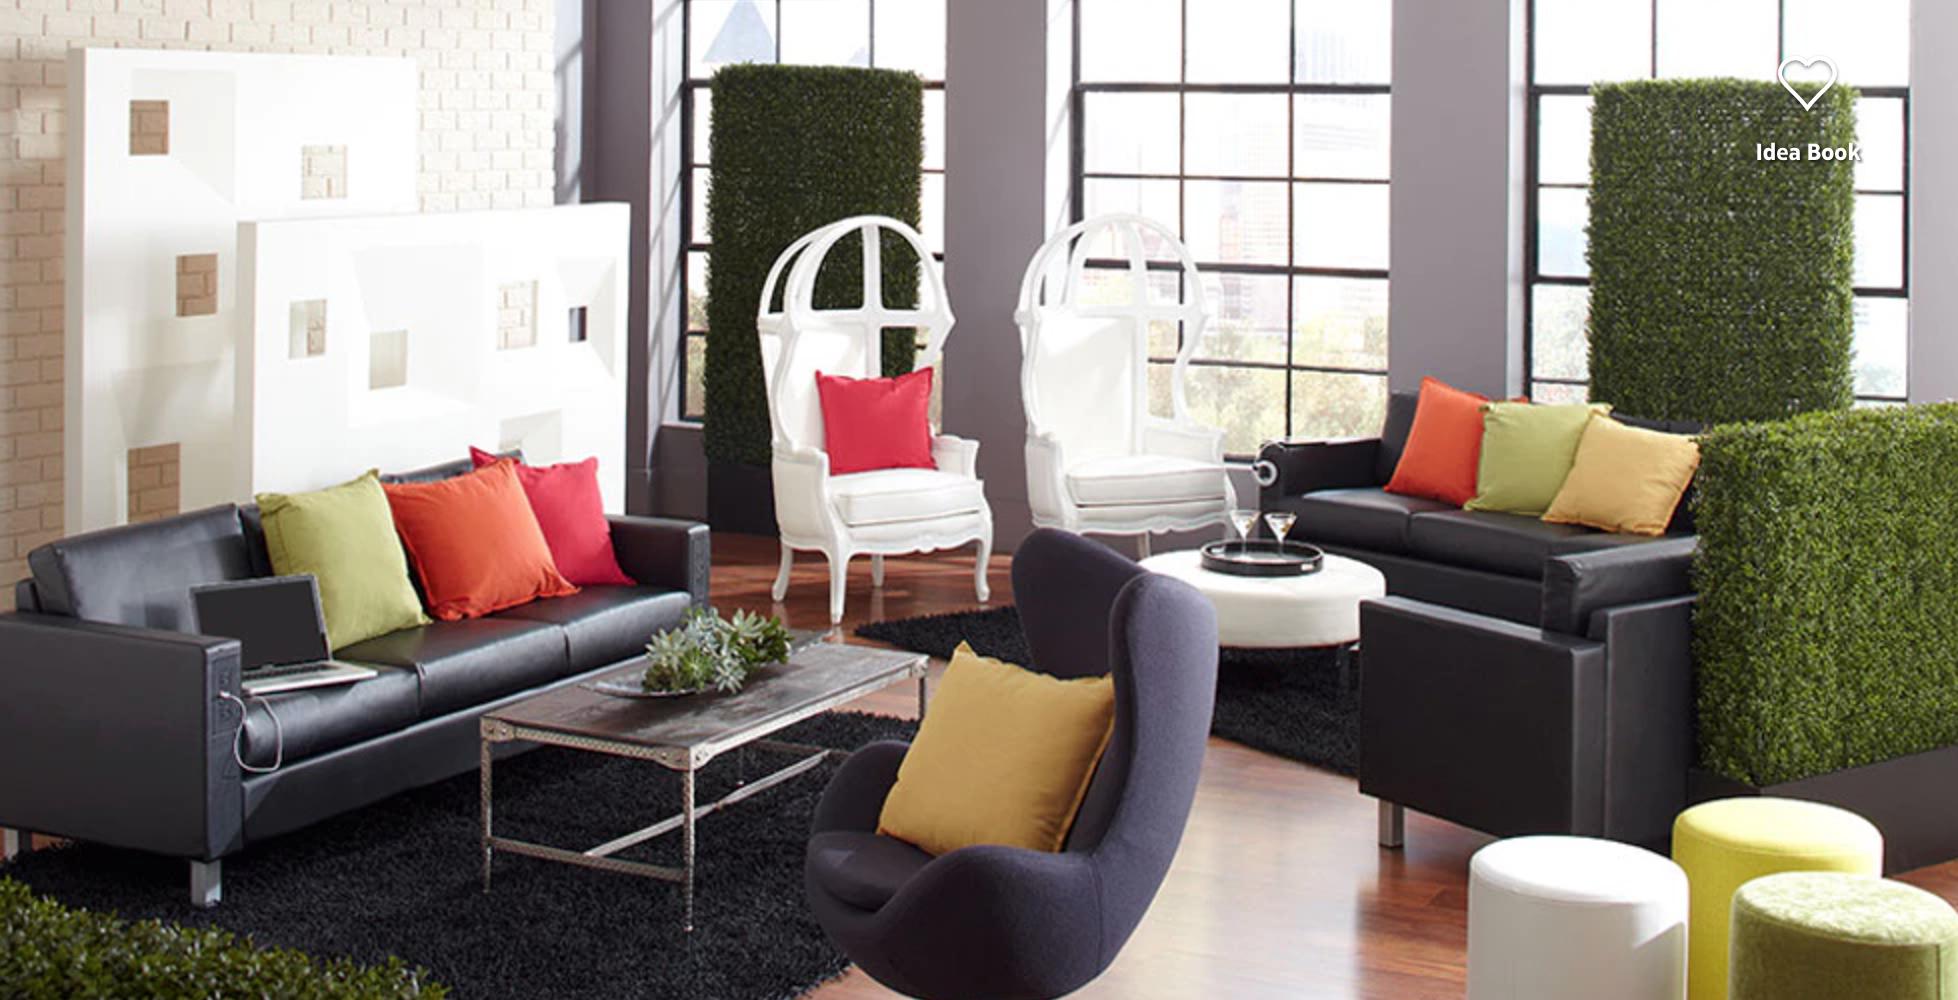 Cort Furniture Grass Carpet Is Nice